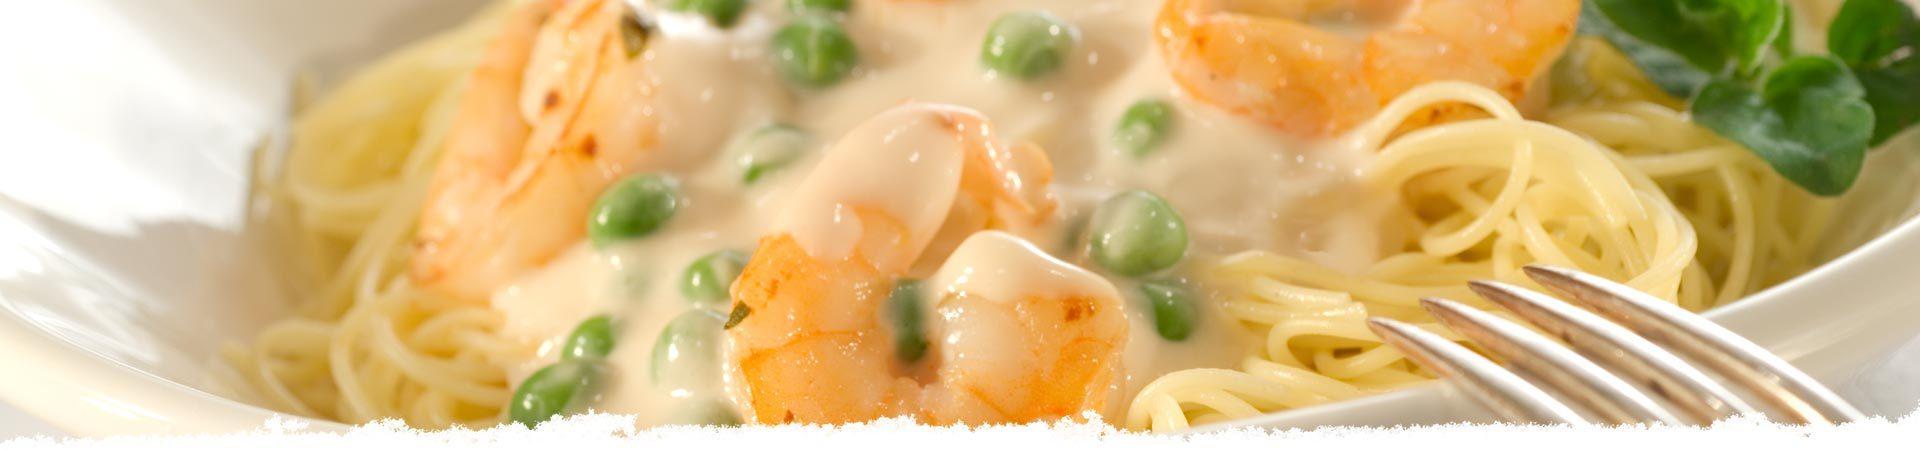 Creamy Garlic Shrimp With Angel Hair Pasta